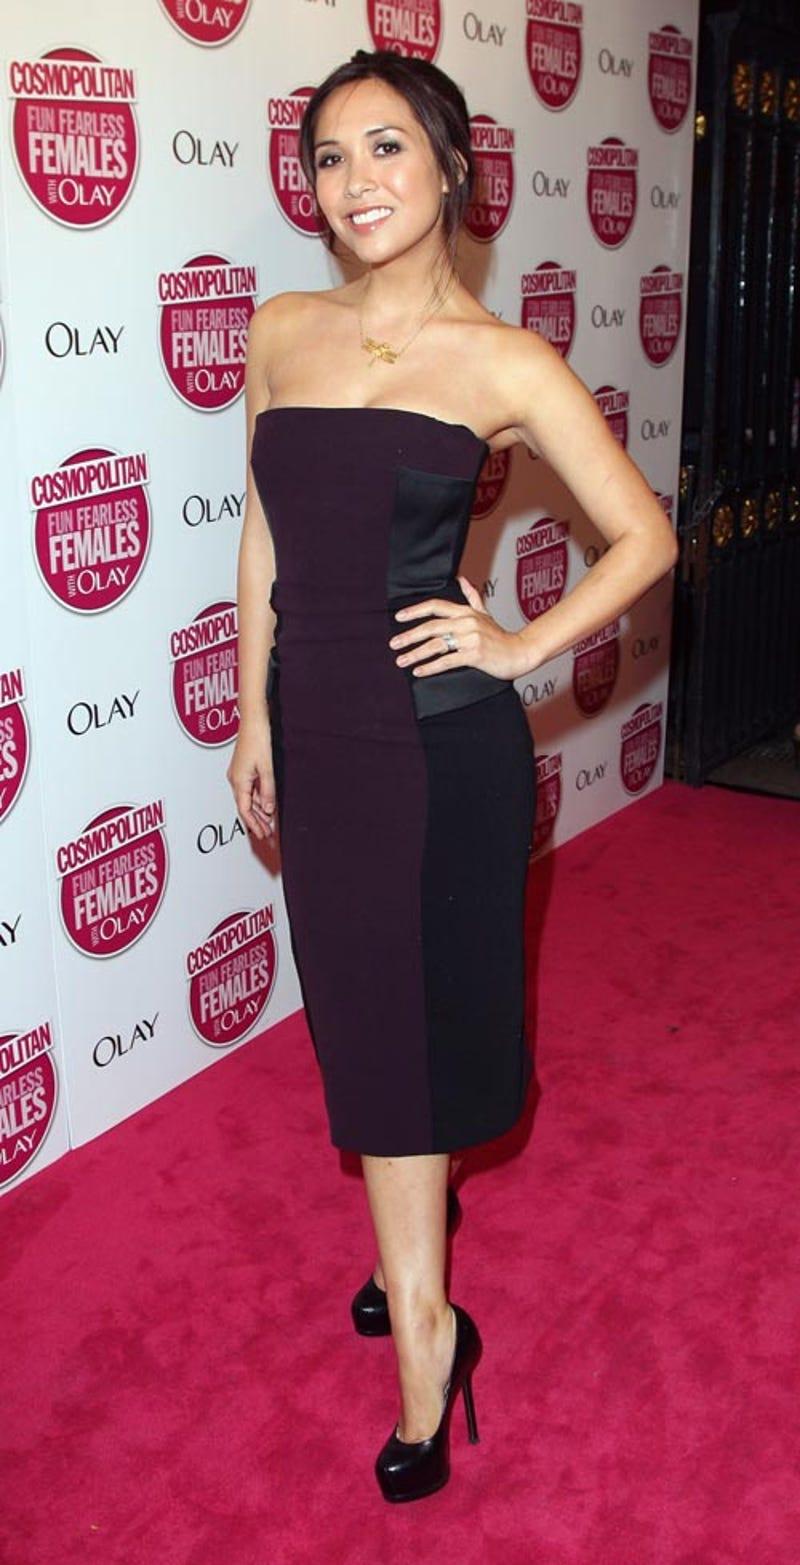 Alesha dixon pictures cosmopolitan ultimate women of the year awards - Alesha Dixon Pictures Cosmopolitan Ultimate Women Of The Year Awards 68